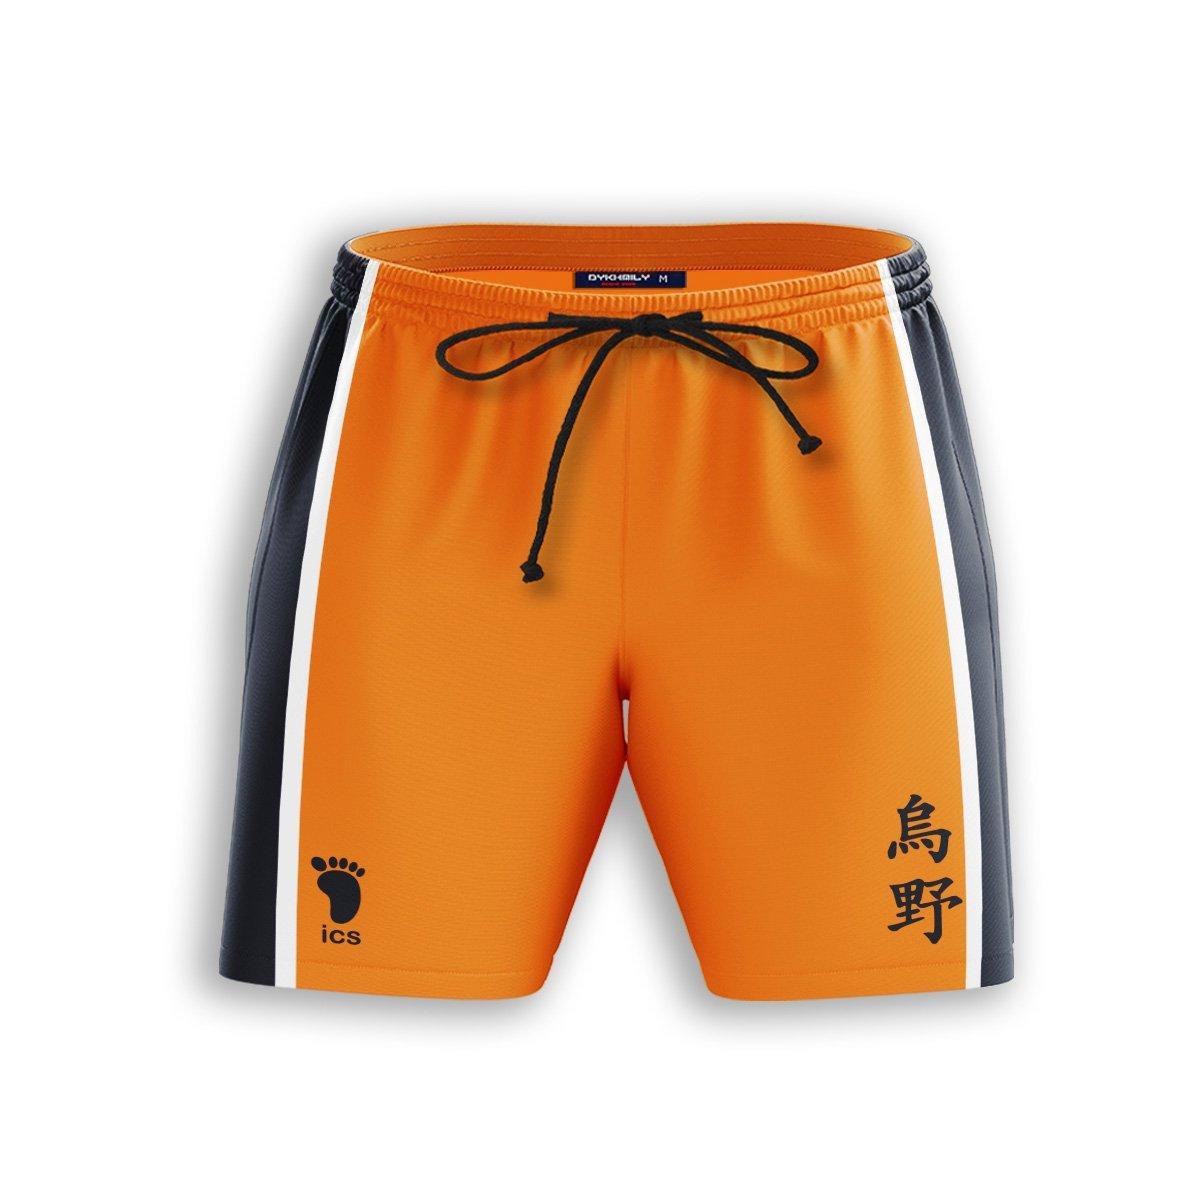 Karasuno Libero Beach Shorts FDM3107 S Official Anime Swimsuit Merch